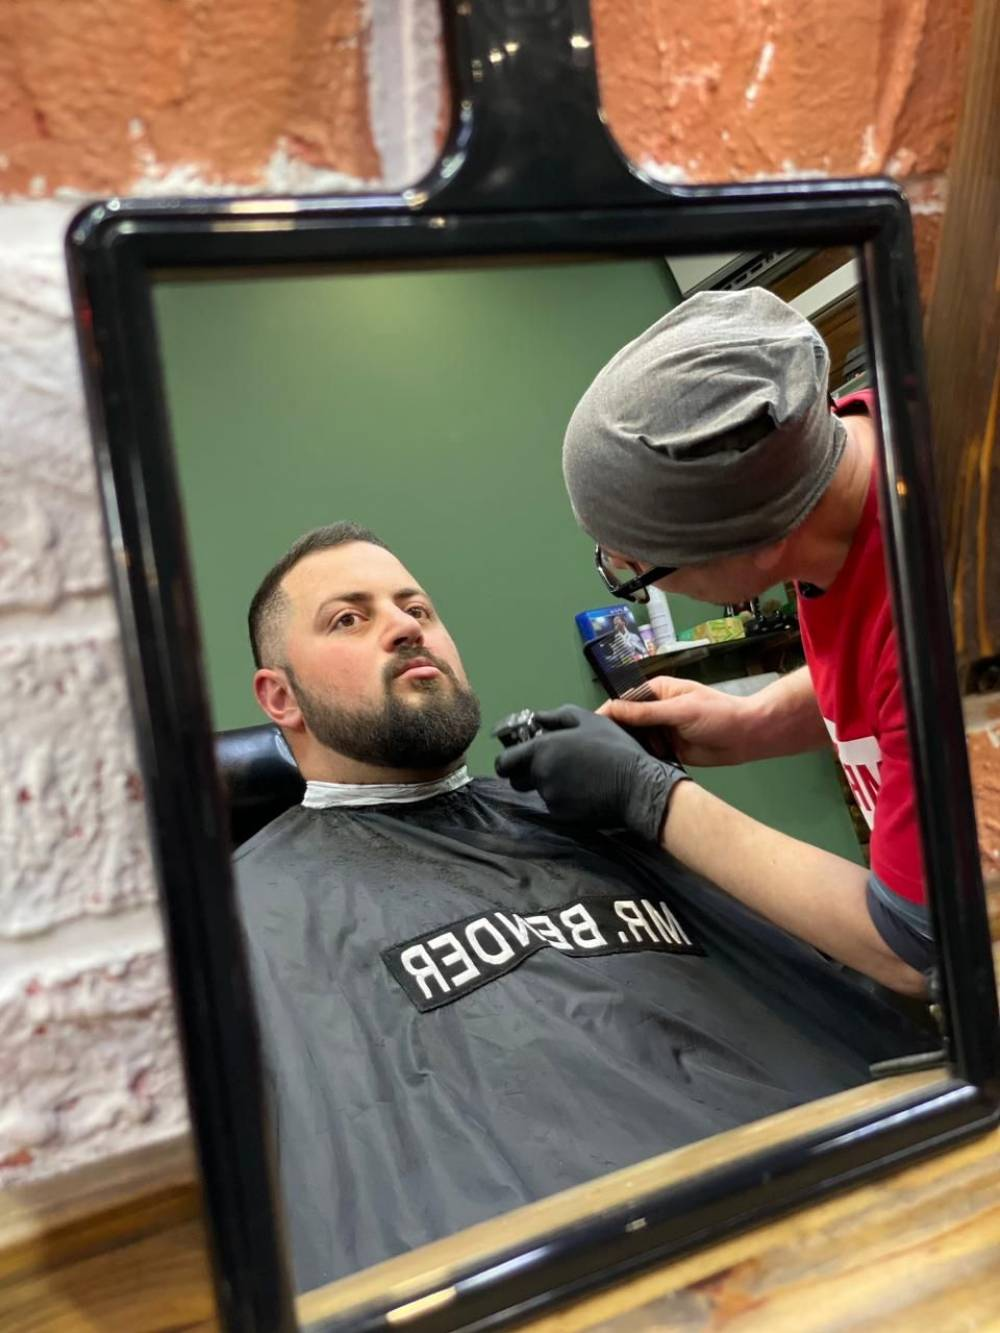 Barbershop Mr.Bender. МОЙ БИЗНЕС.